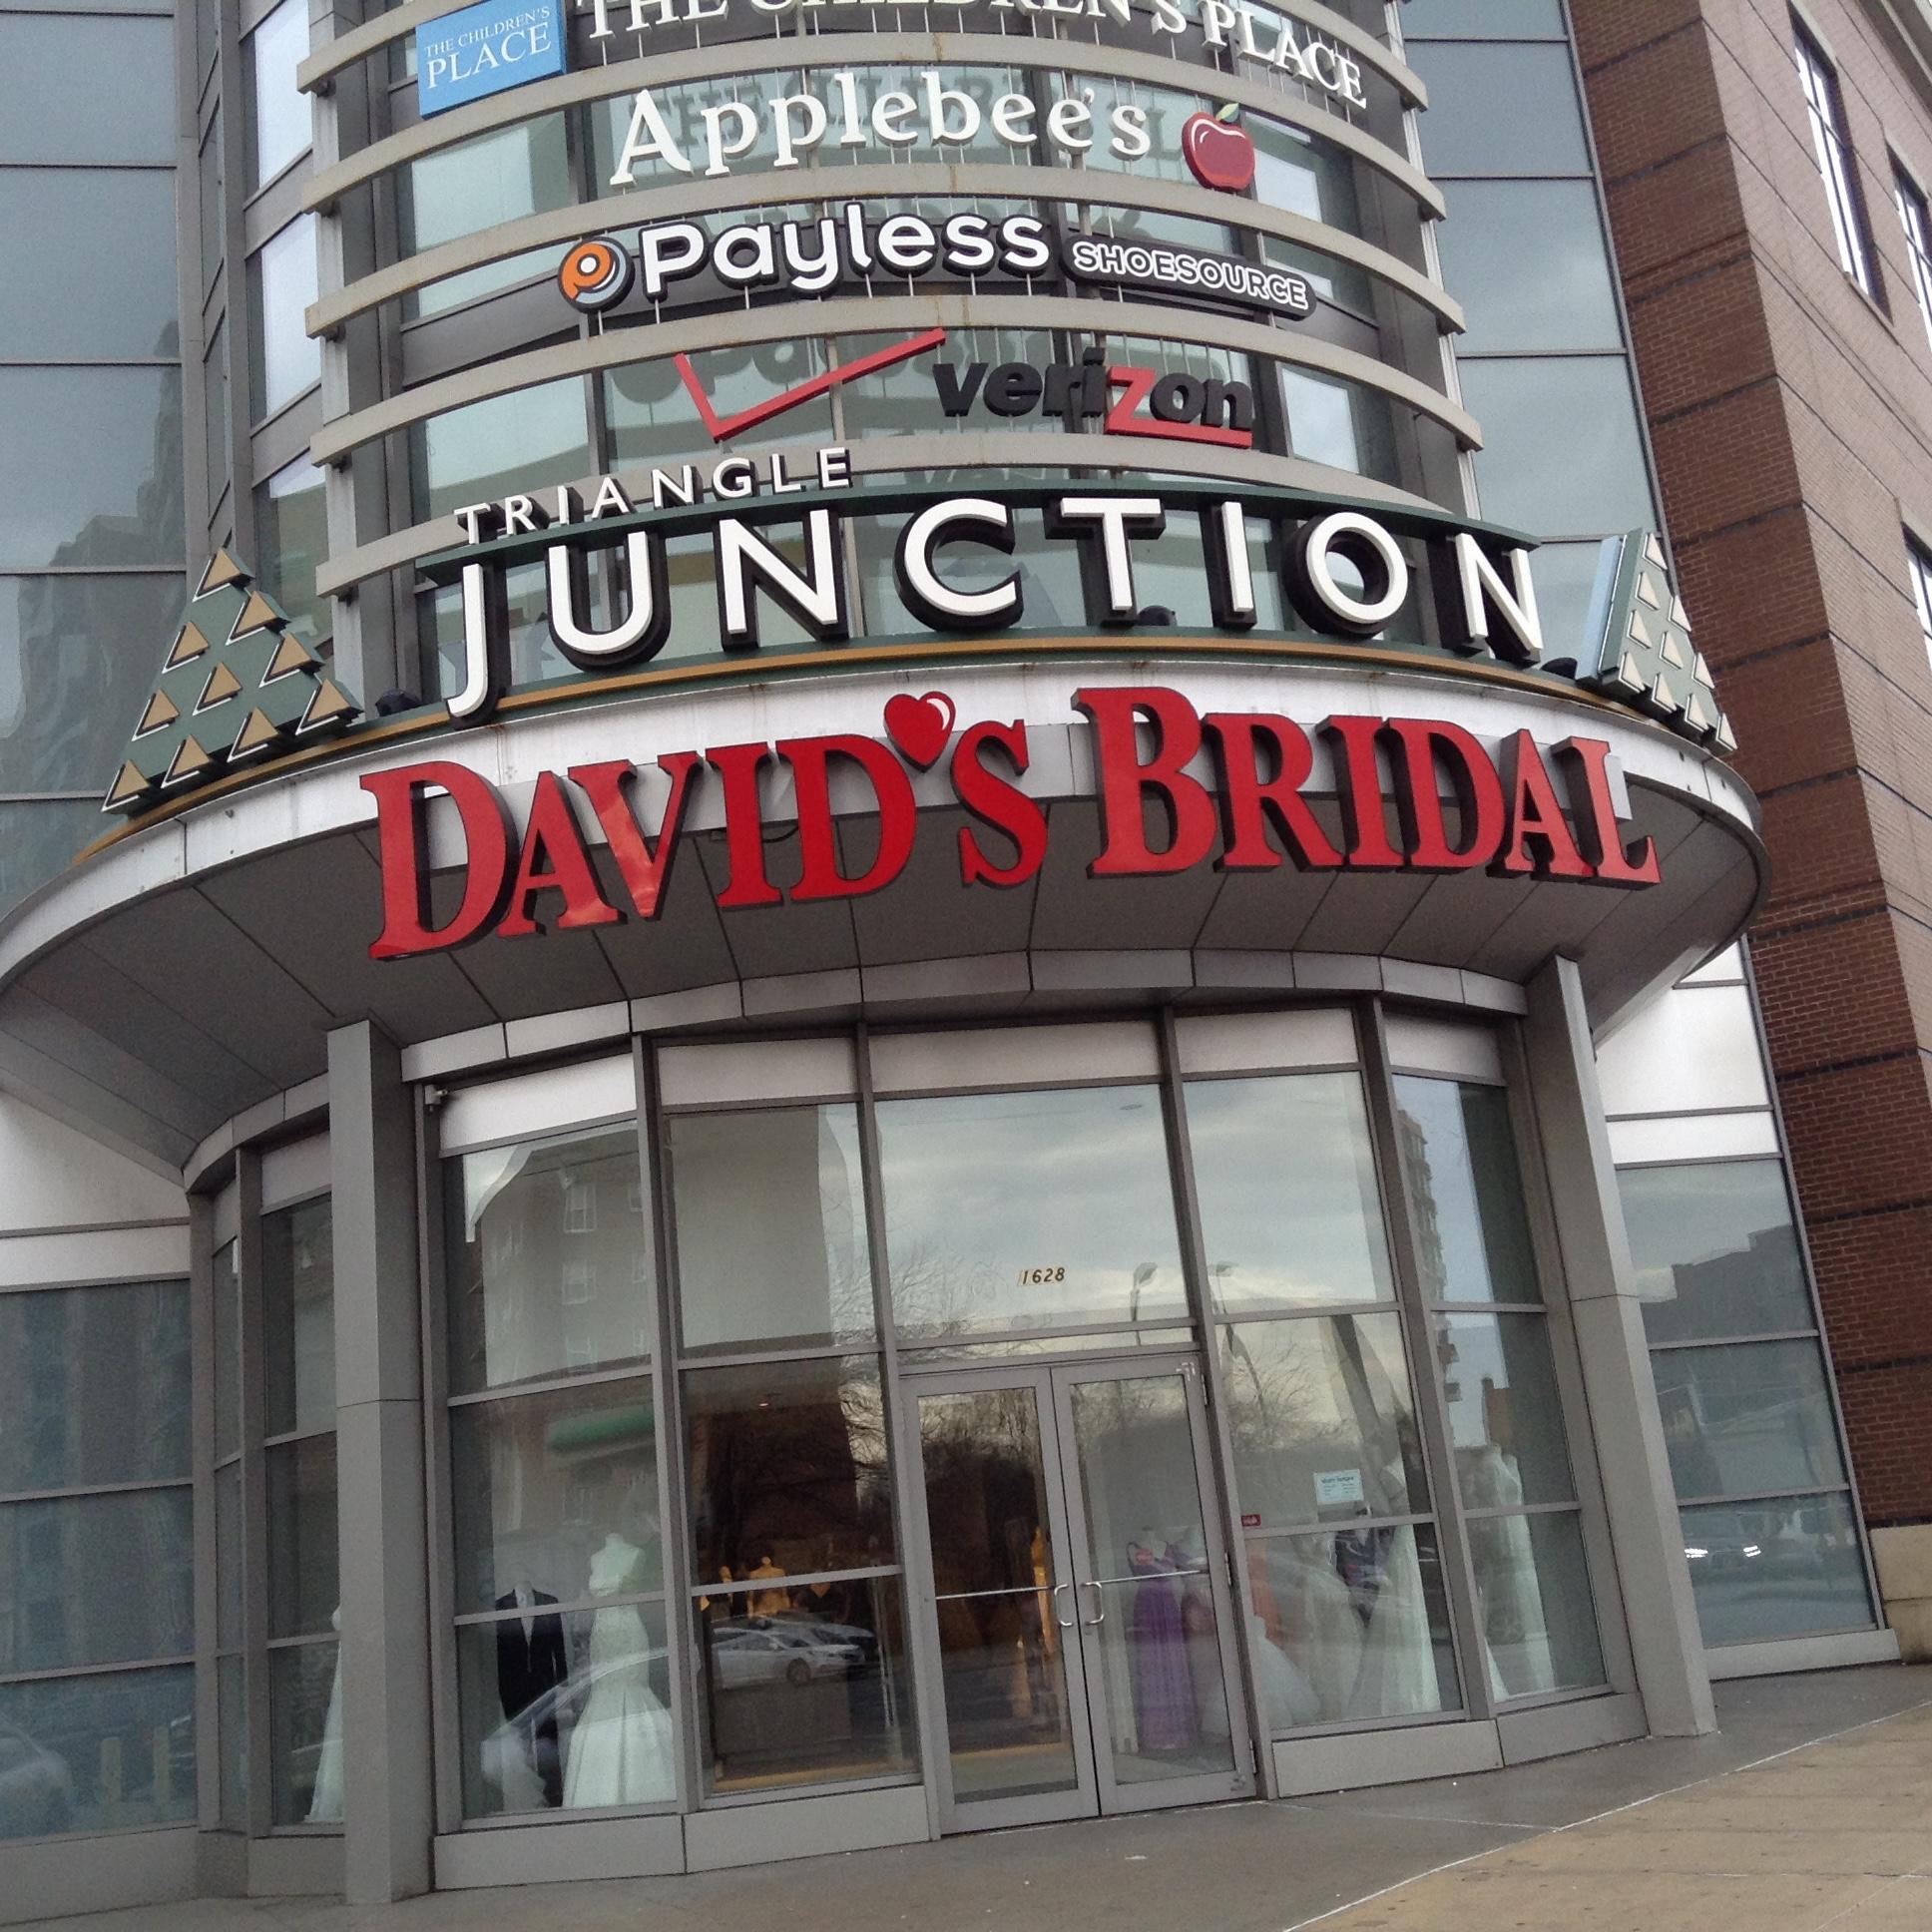 David's Bridal - CLOSED image 0